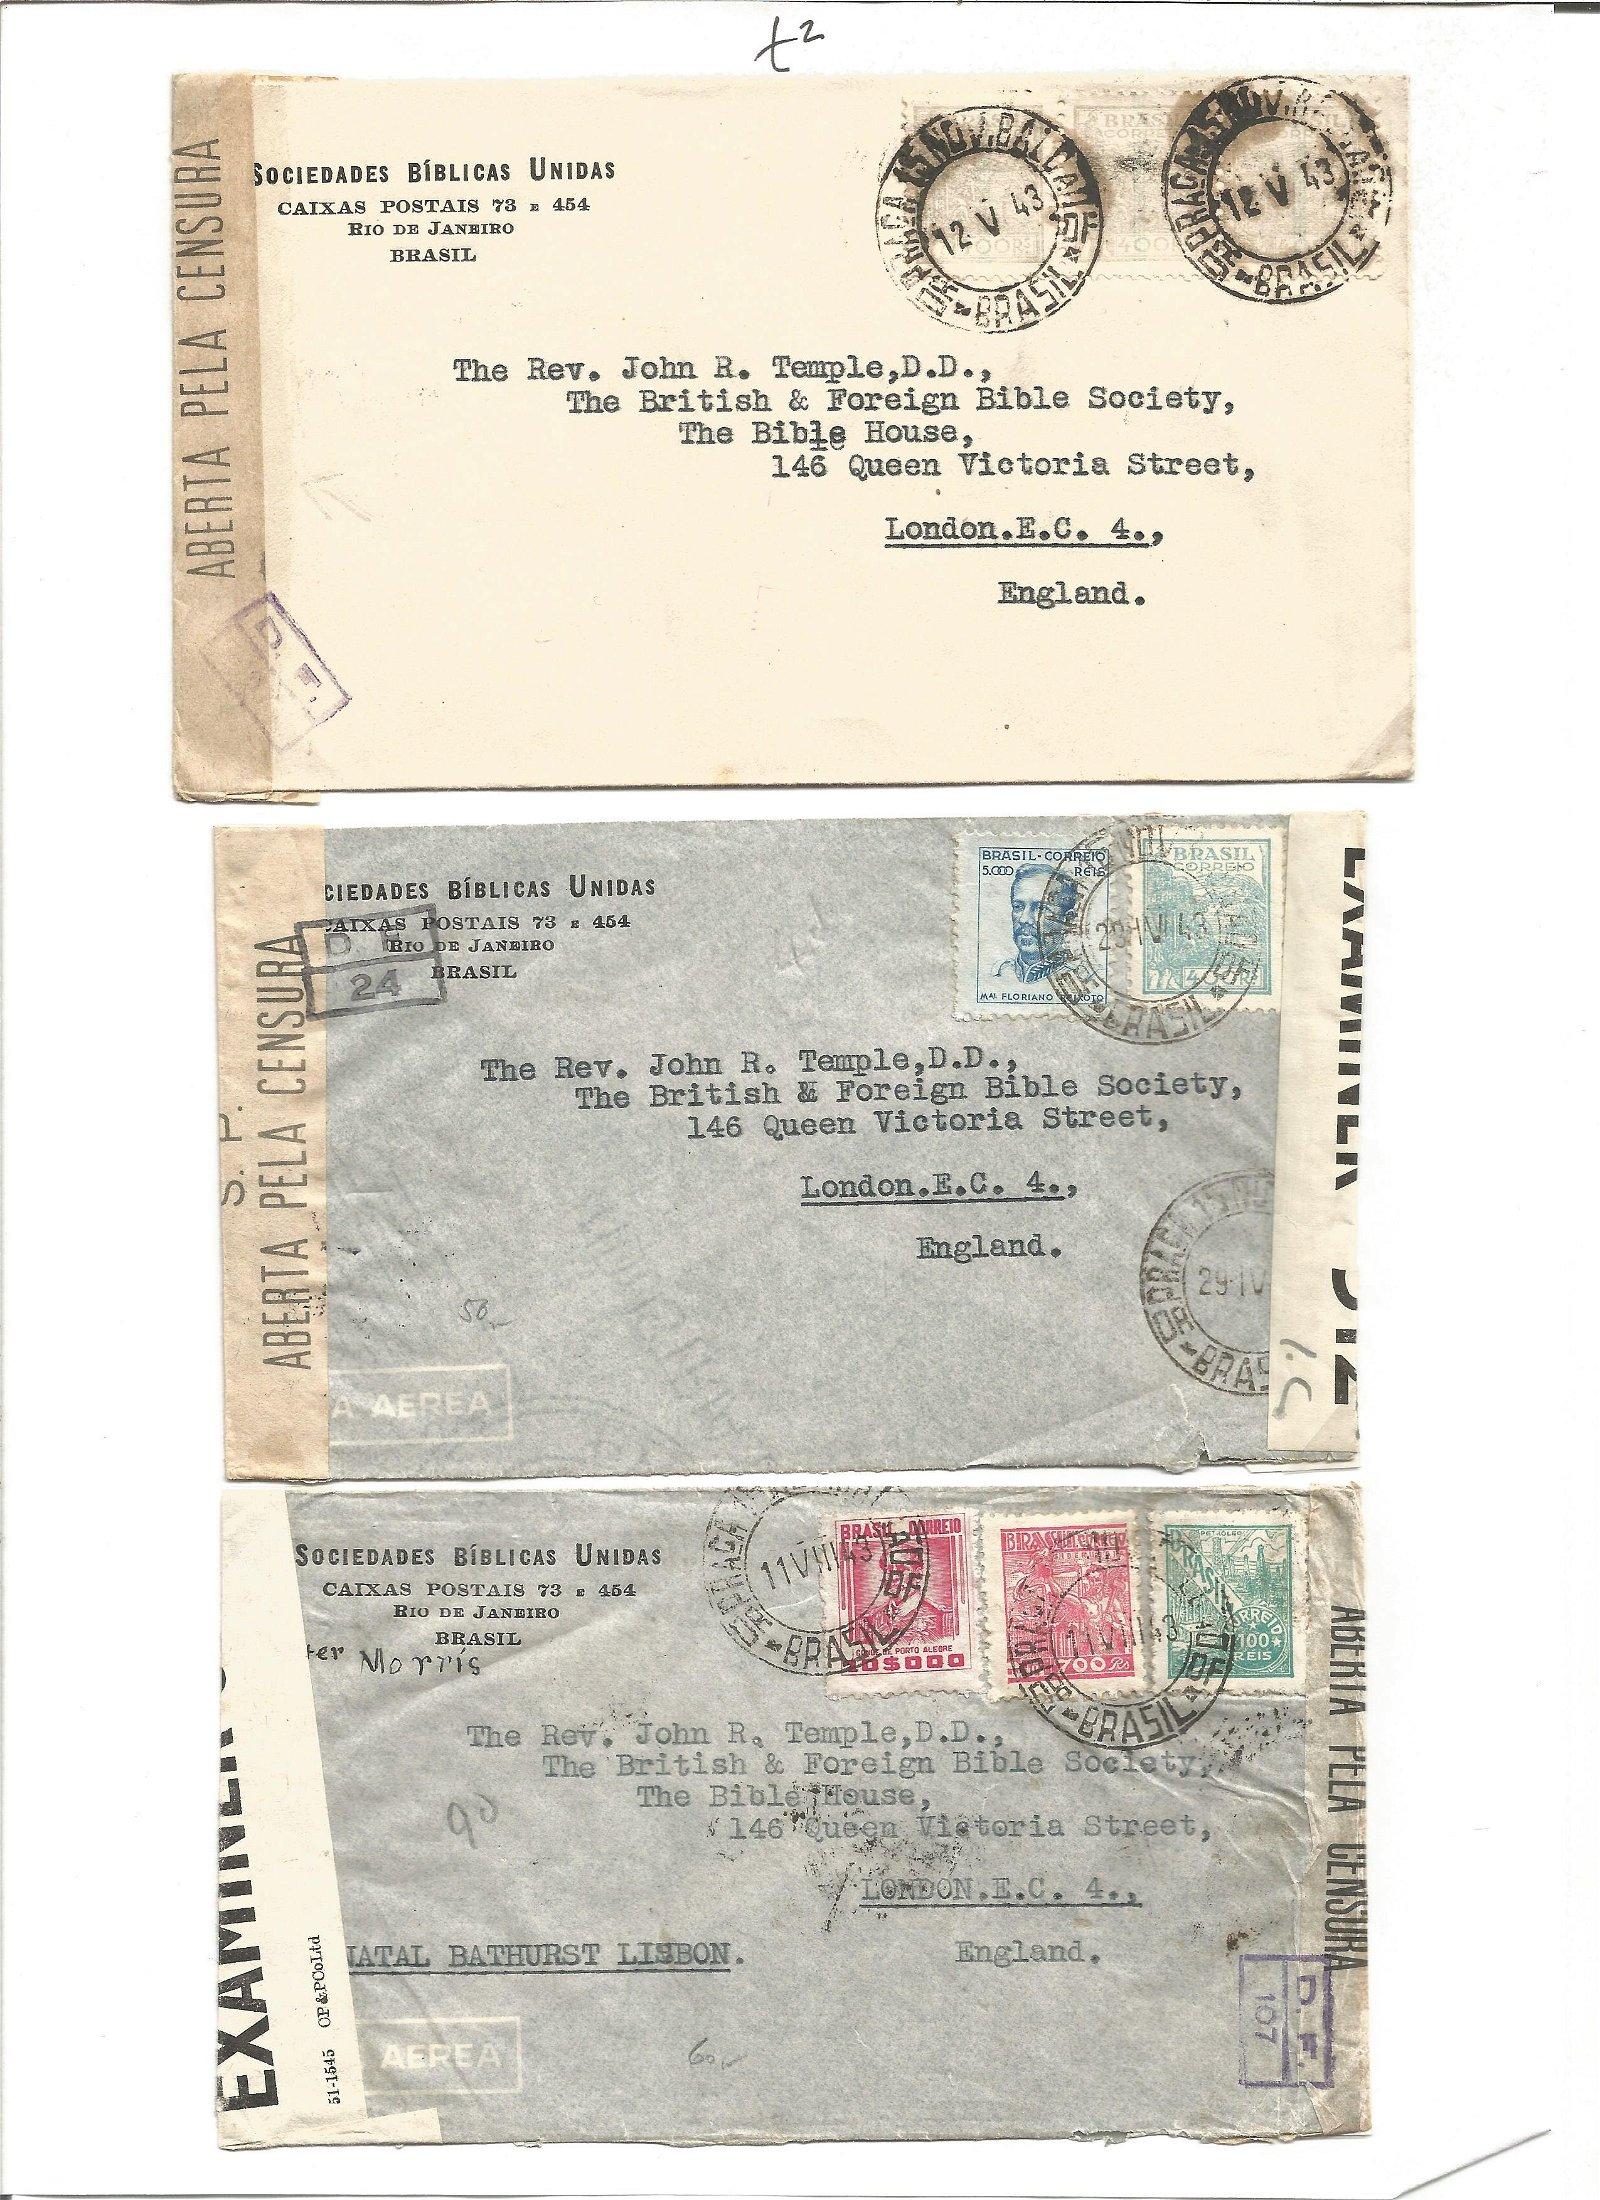 Postal History. 3 letter envelopes. Good Condition. We